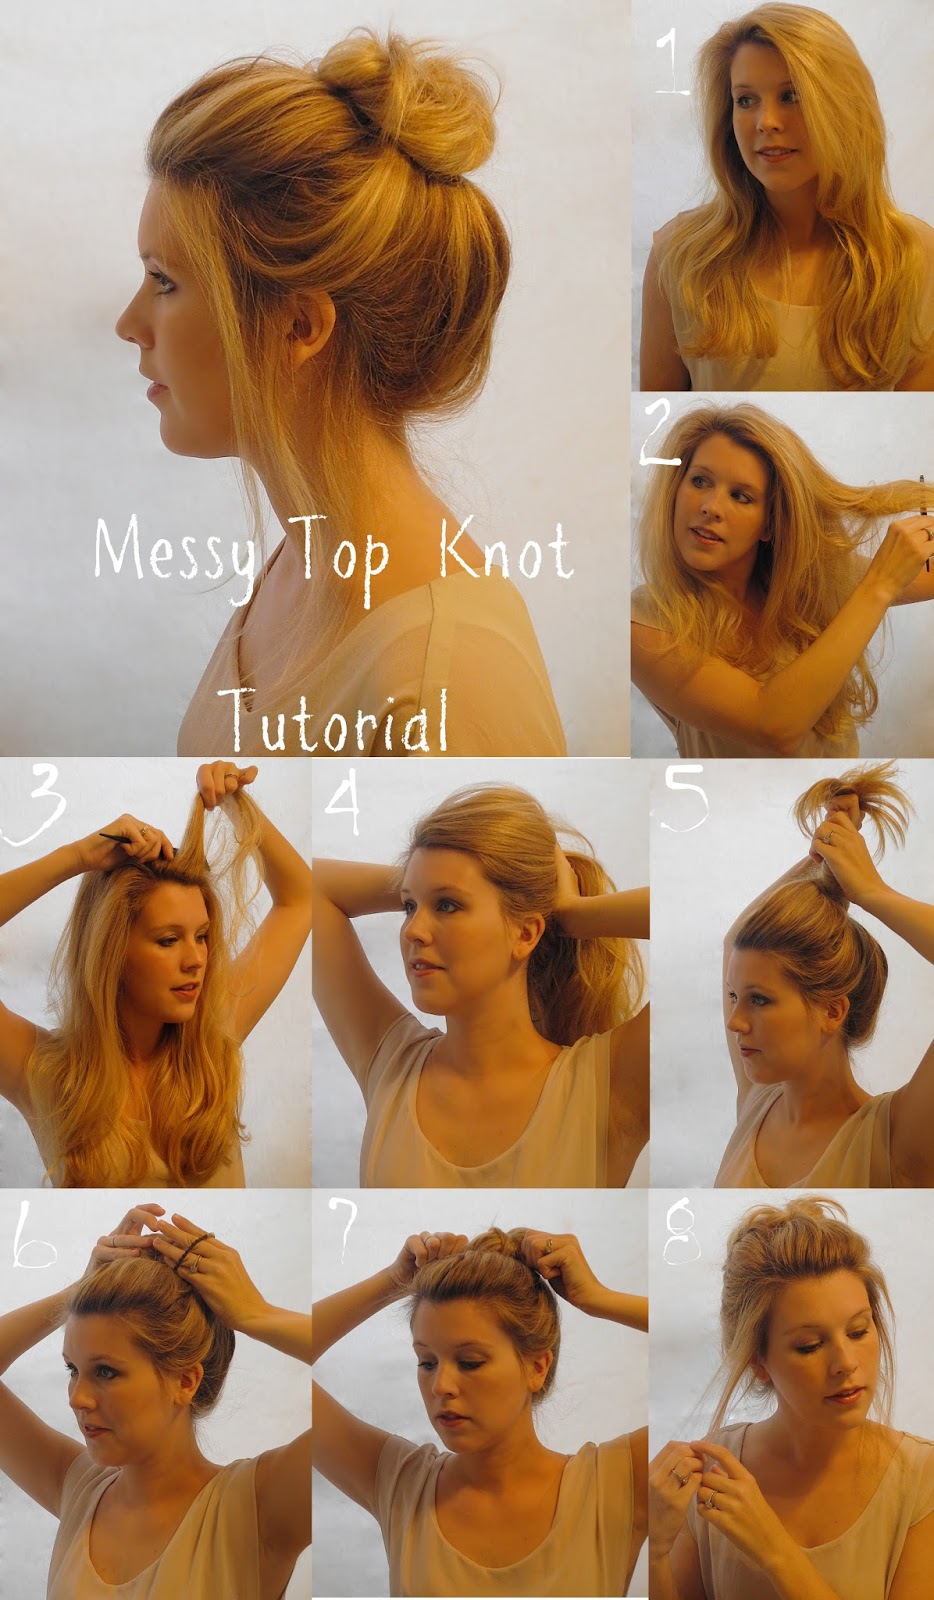 Strange Top 25 Messy Hair Bun Tutorials Perfect For Those Lazy Mornings Short Hairstyles Gunalazisus